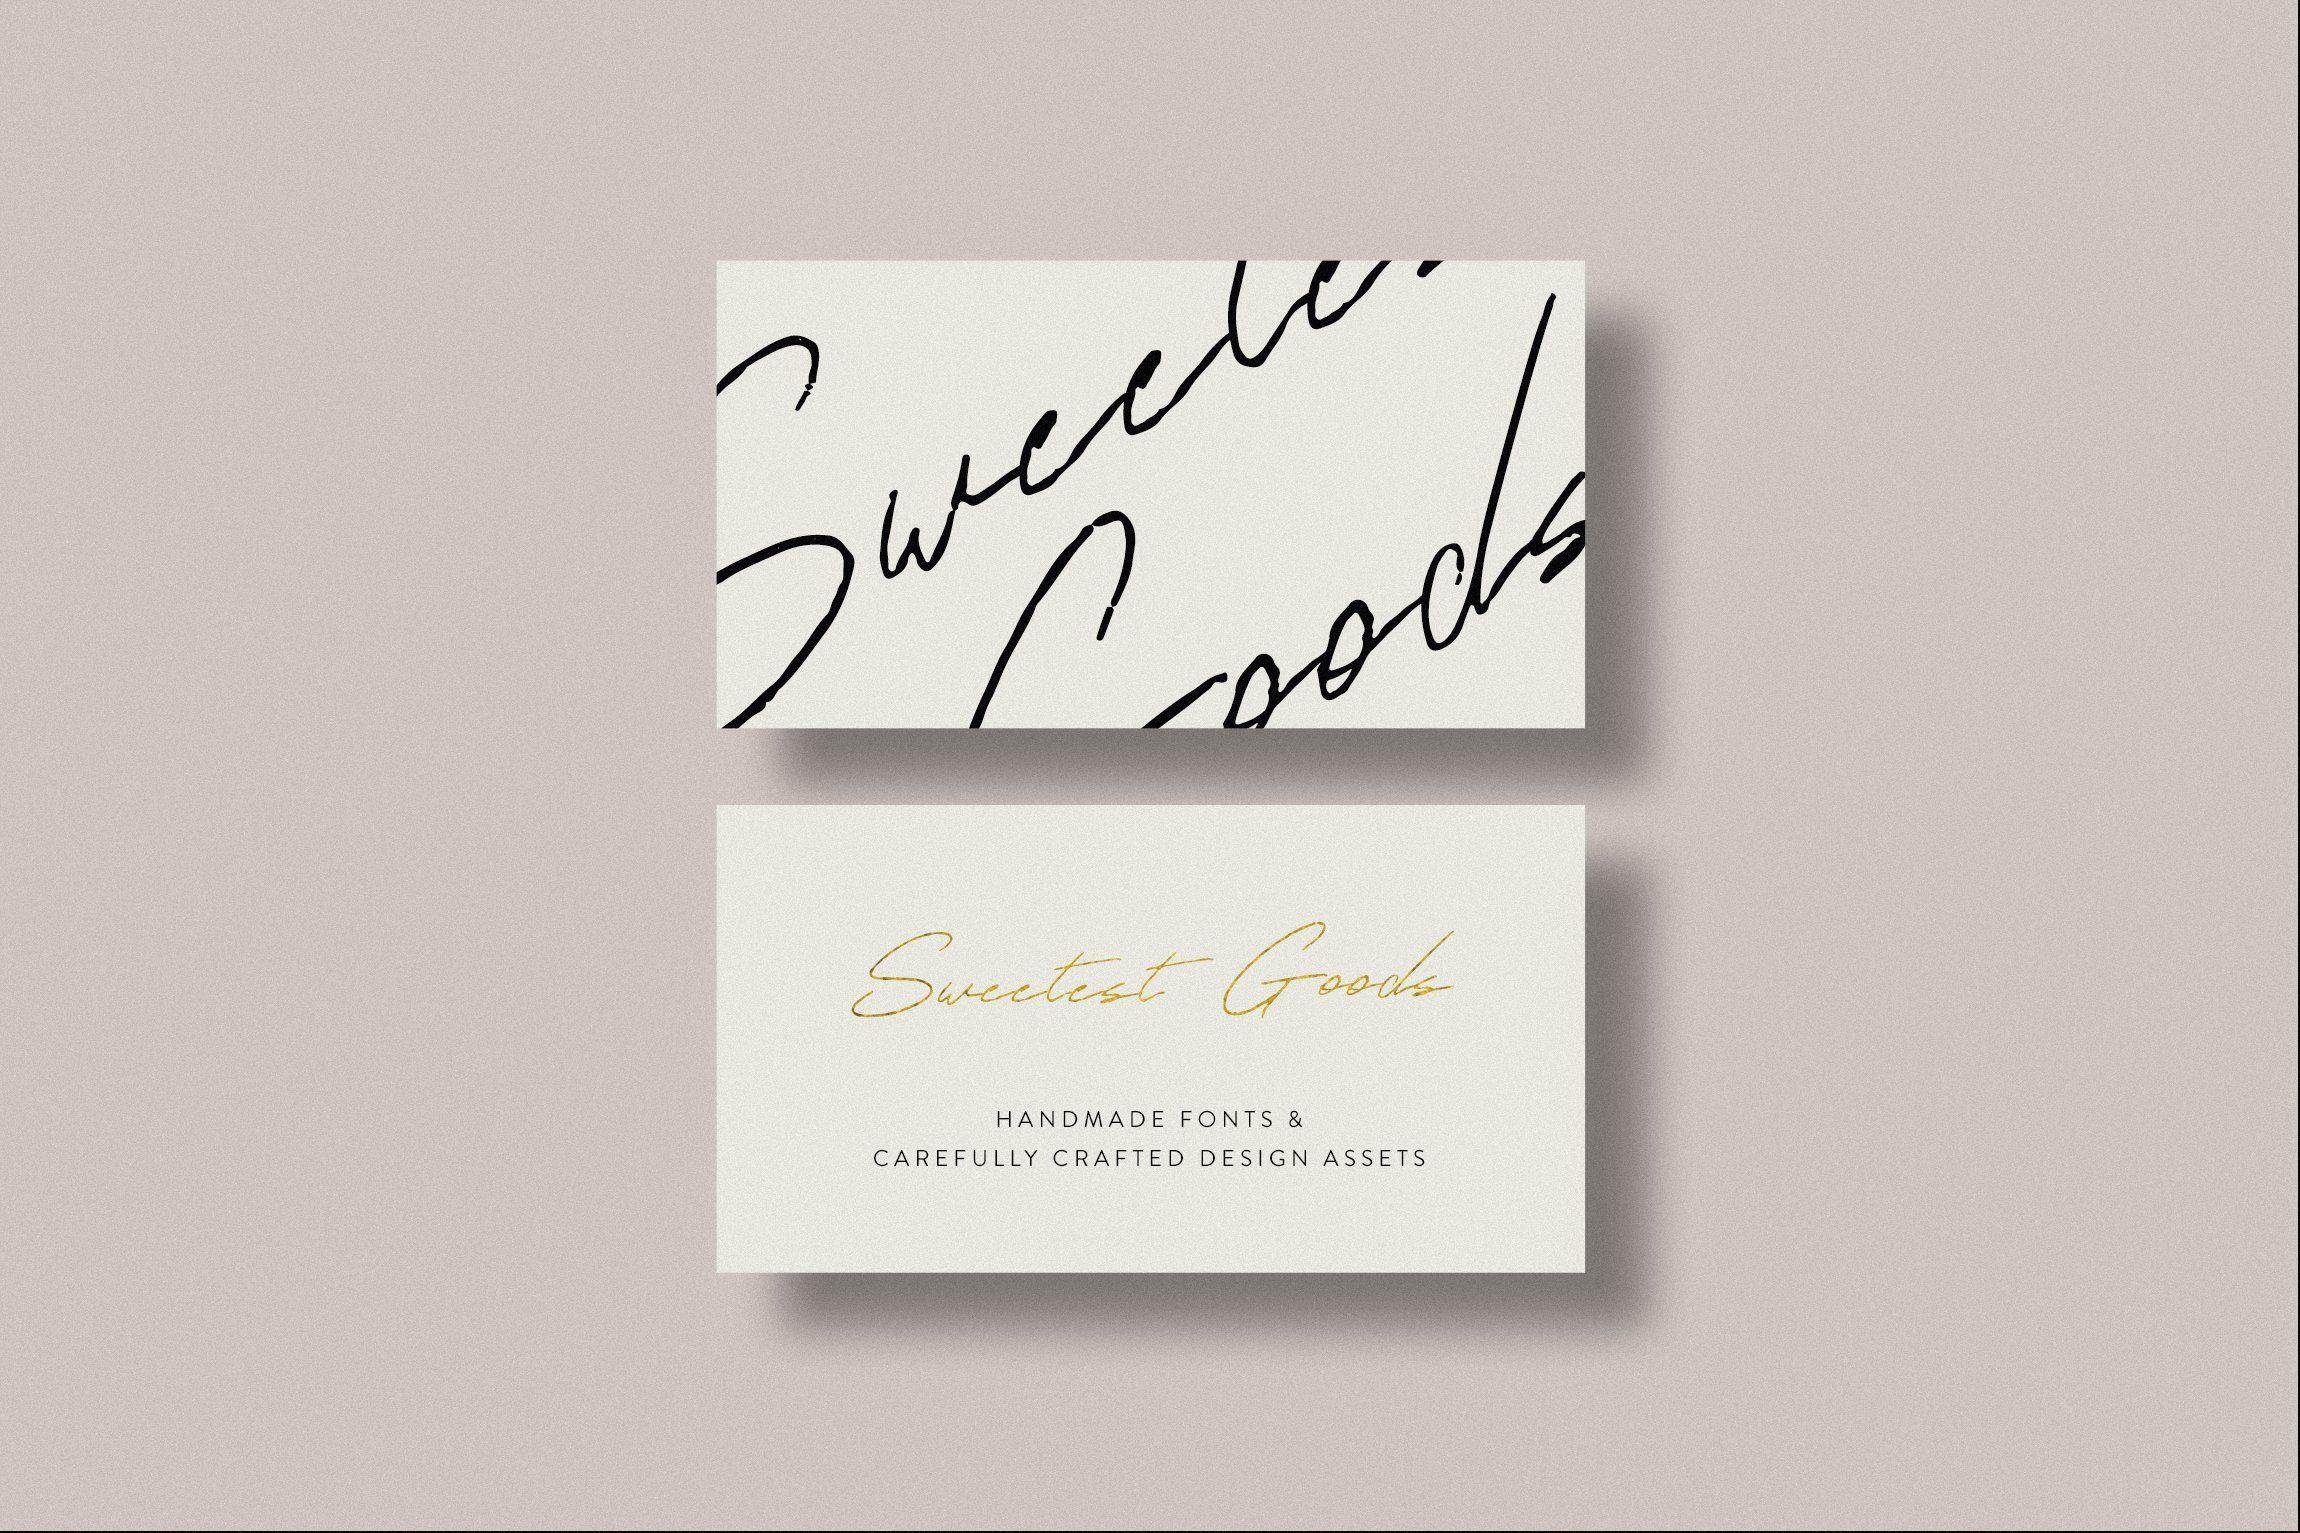 Sugar Rush Handwritten Script Font Typography Business Cards Handwritten Script Font Business Card Inspiration